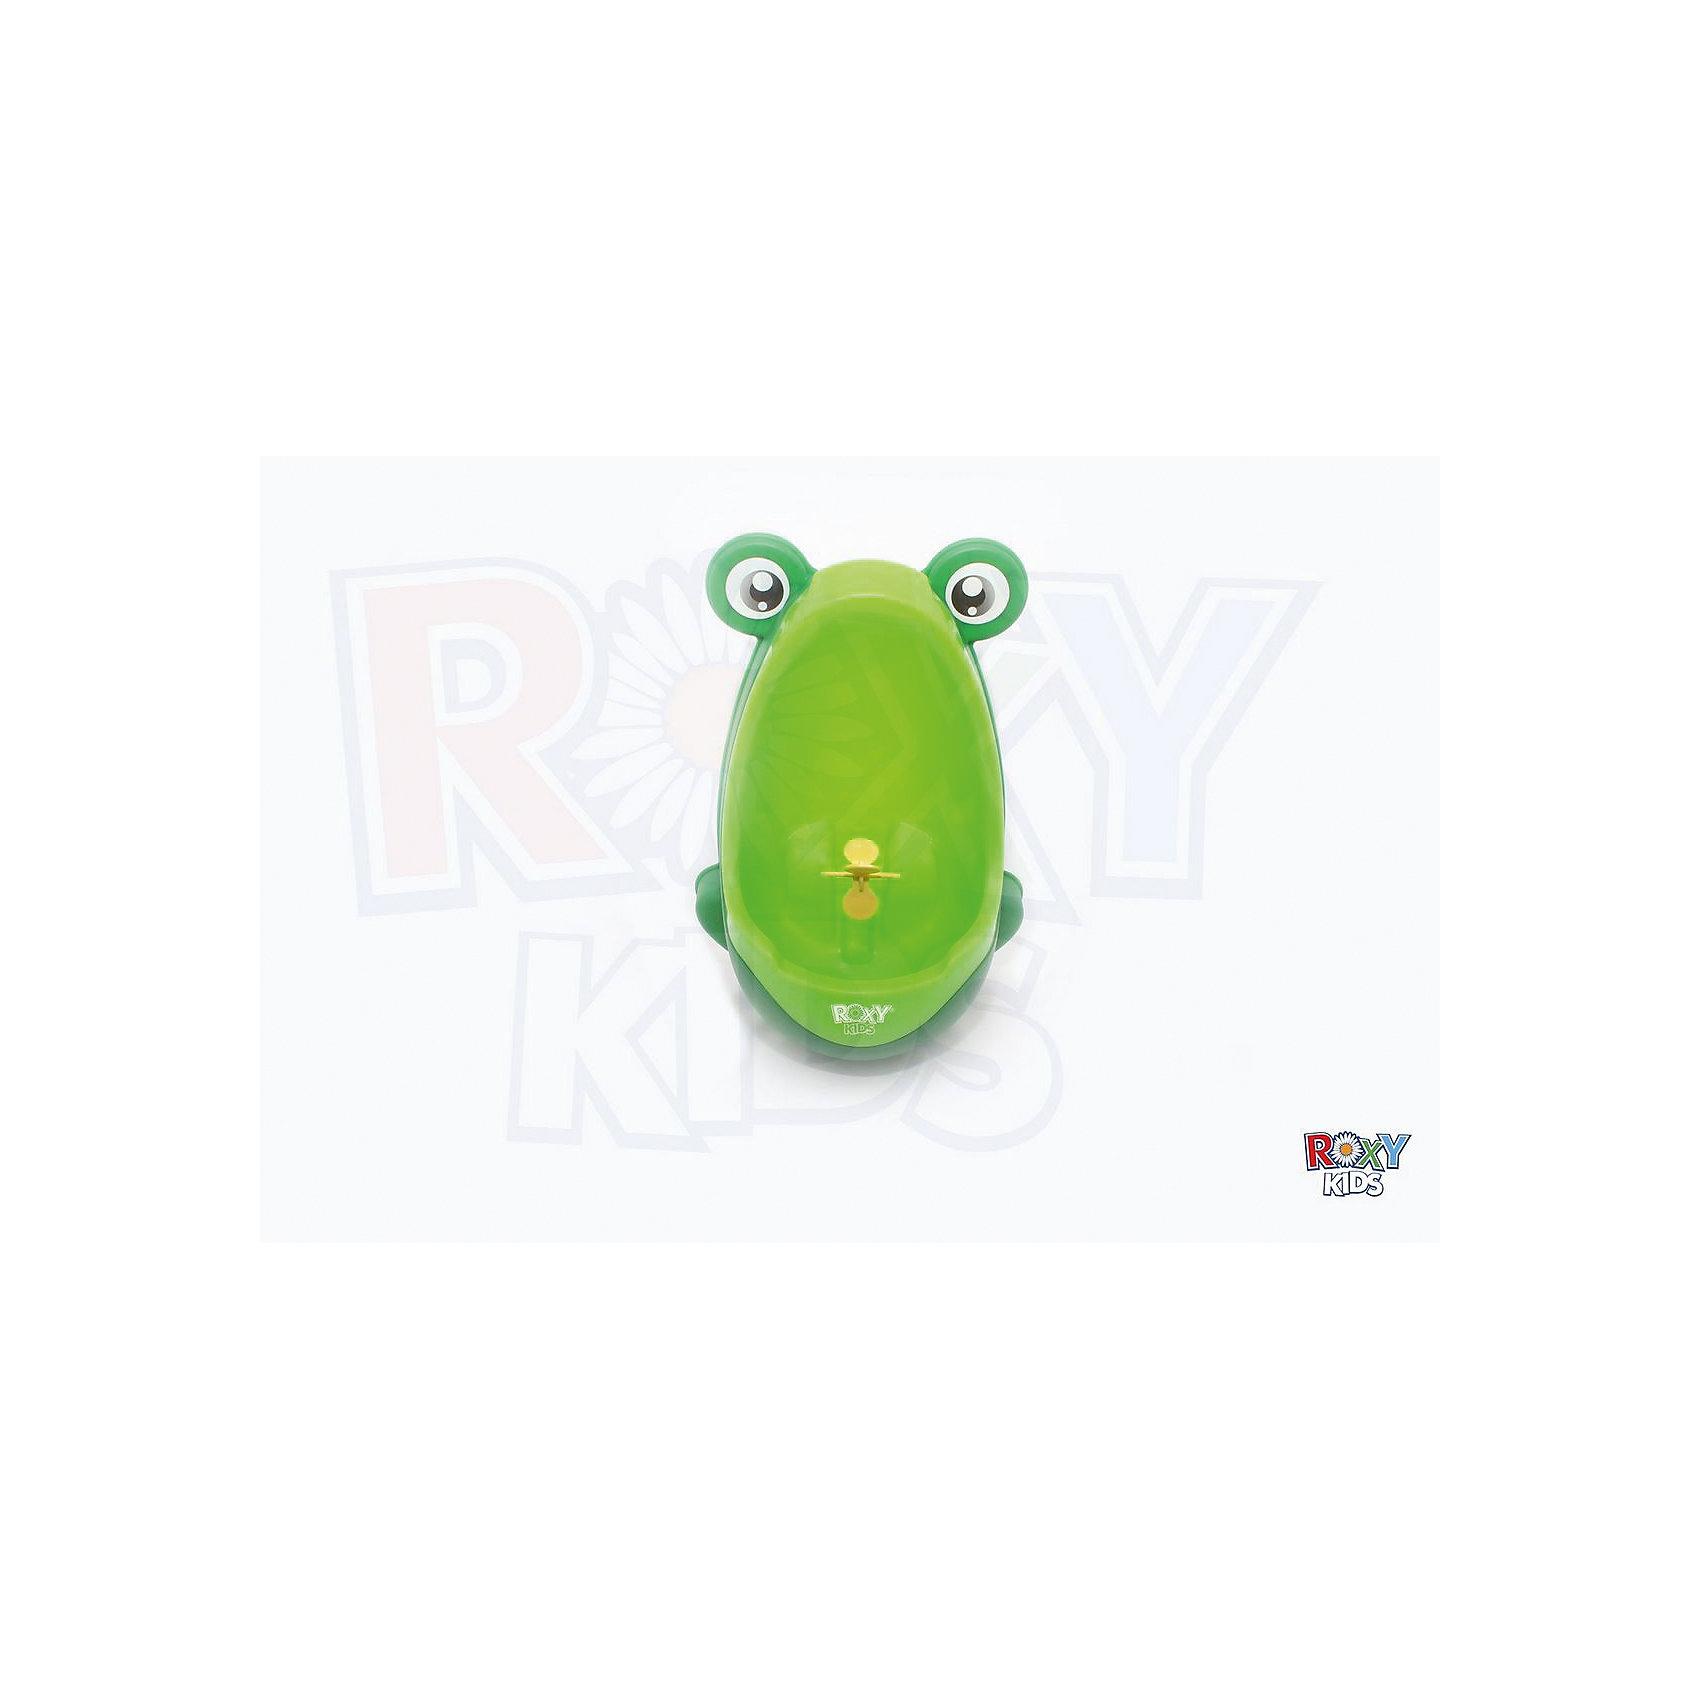 Писсуар с прицелом Лягушка, Roxy-kids, зеленый (Roxy-Kids)